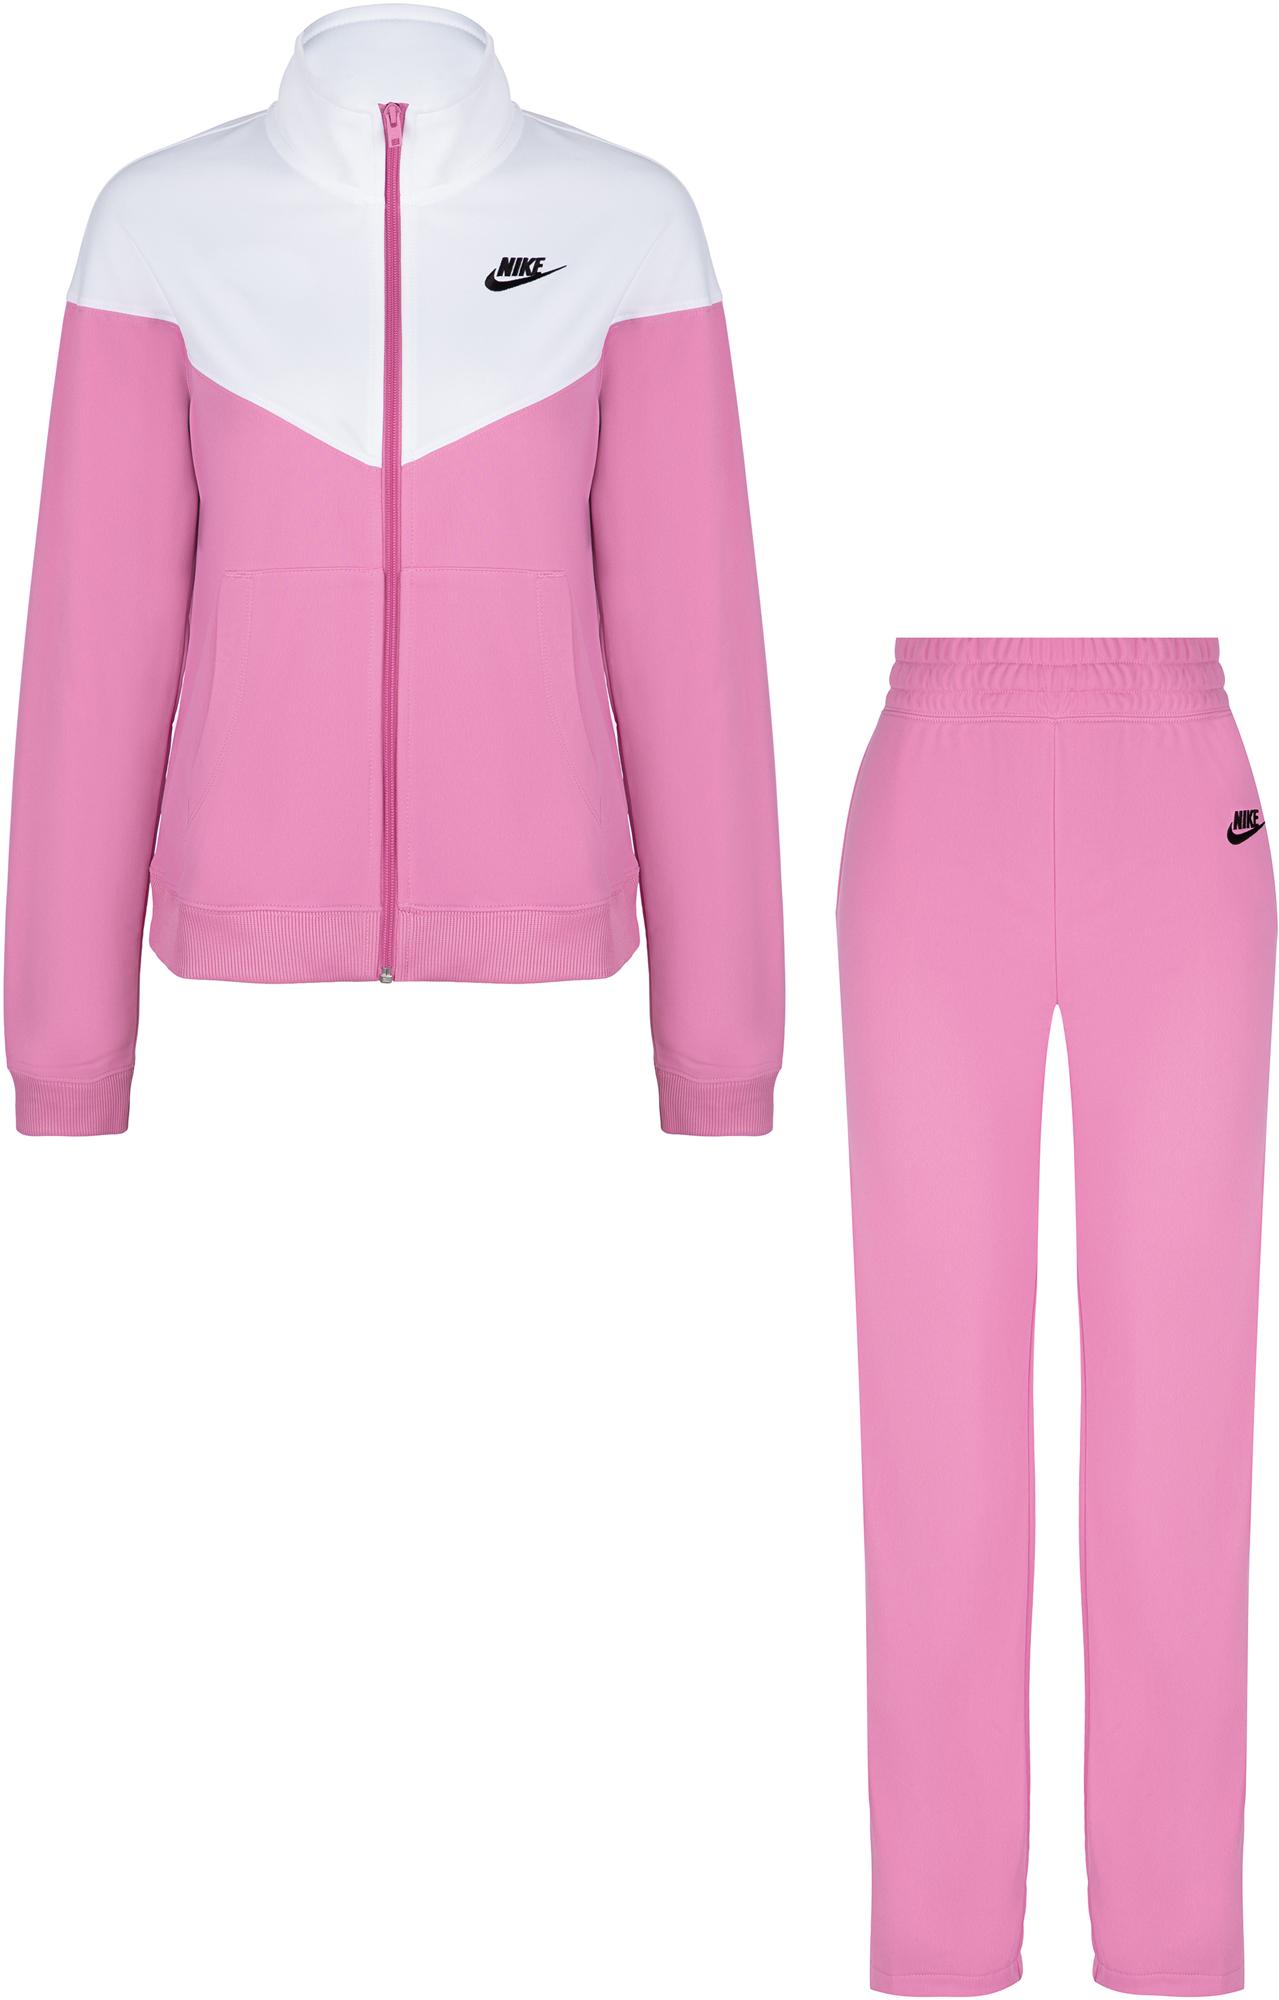 Nike Костюм женский Nike Sportswear, размер 40-42 костюм женский михайлина